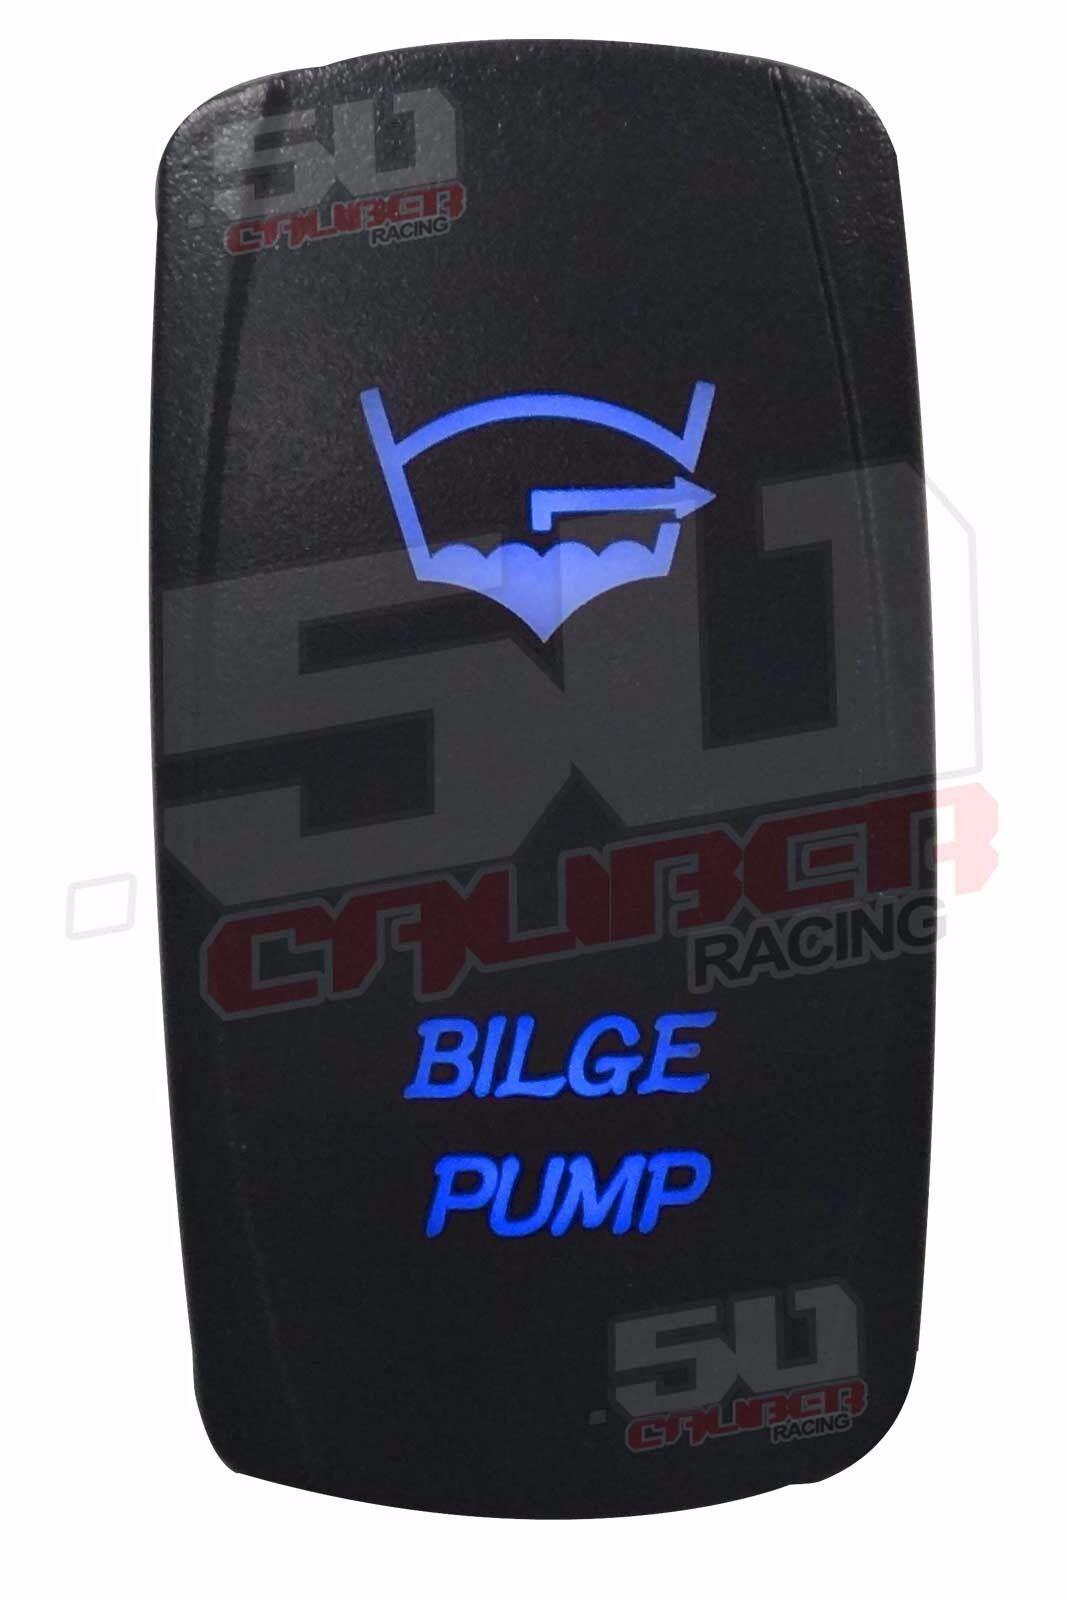 Bilge Pump SPST On/ Off Rocker Switch Blue Alumaweld Bayliner Cobalt Chris Craft